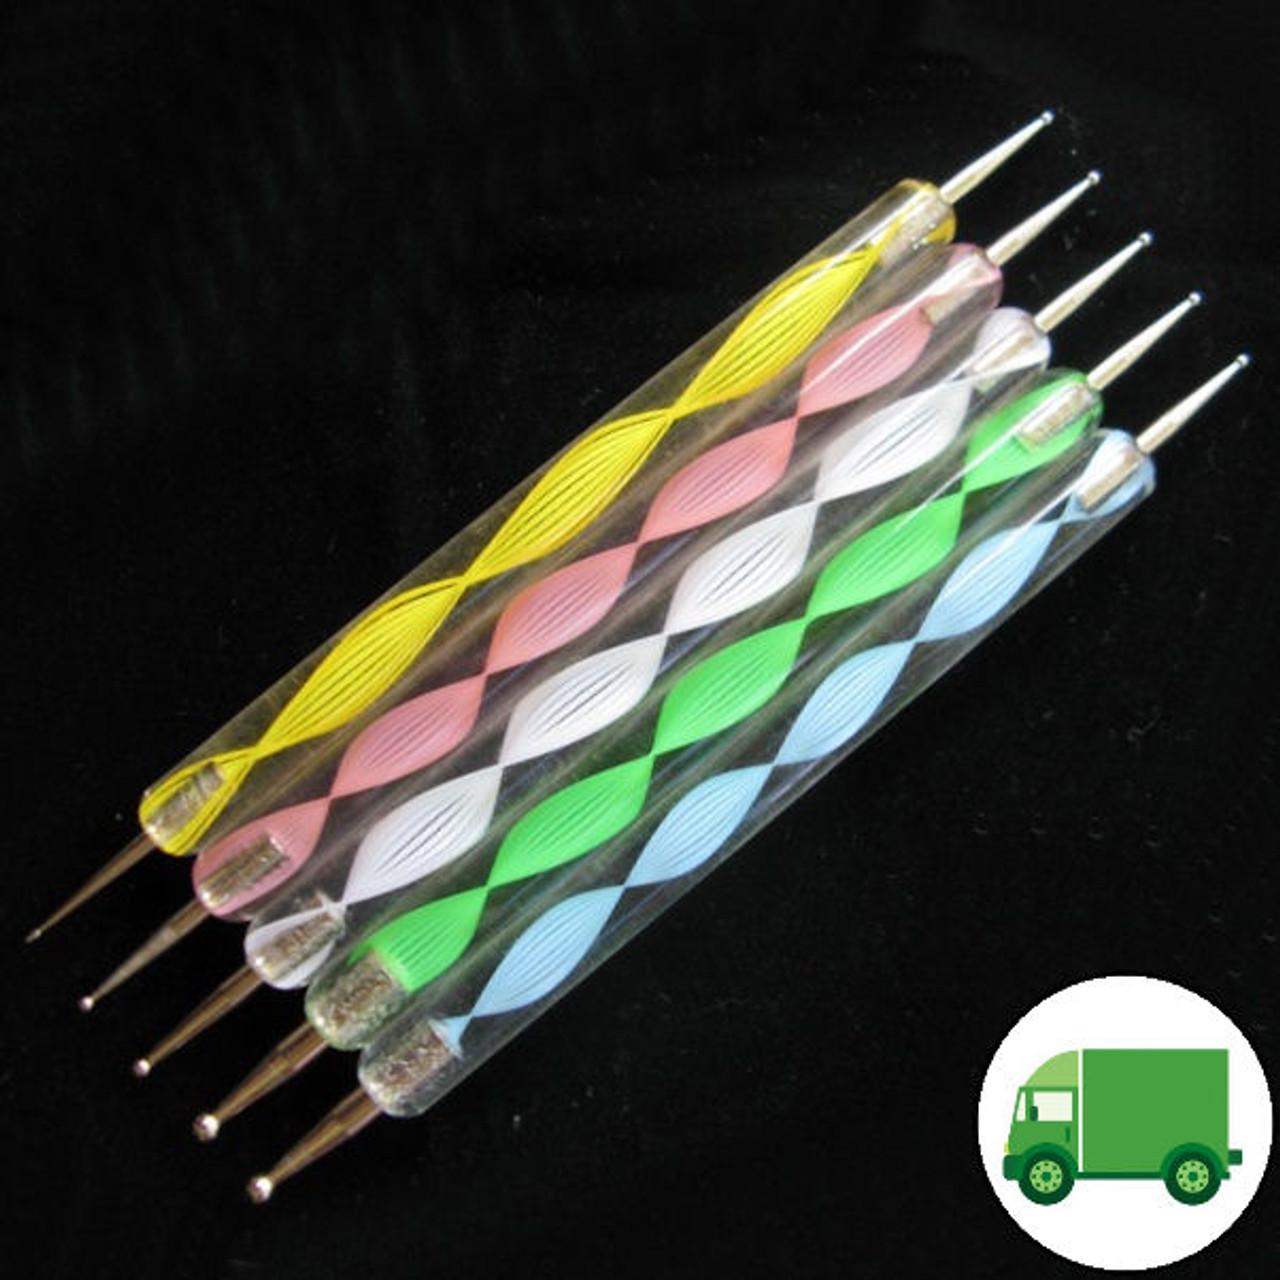 Silicone Dotting Tools for mandala - 3/16 - 5mm Silicone